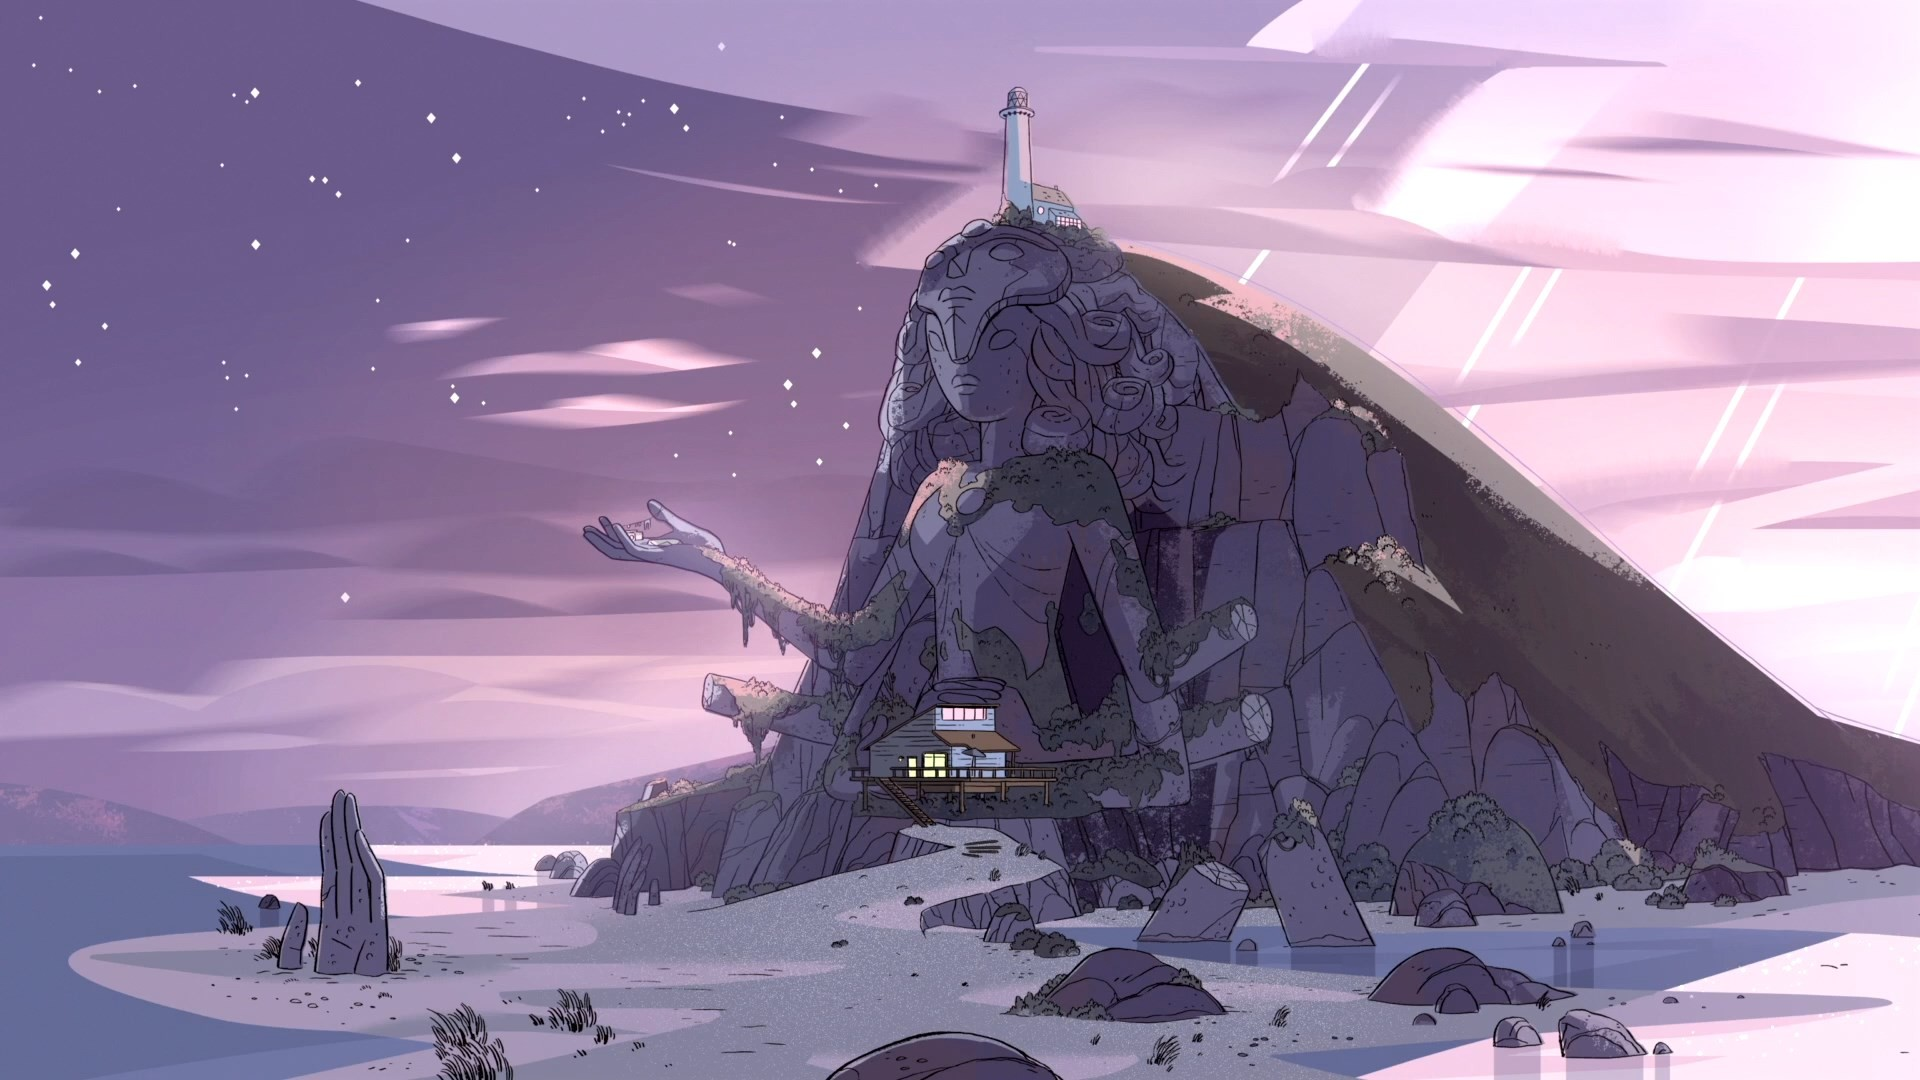 HD Steven Universe Wallpaper (78+ images)